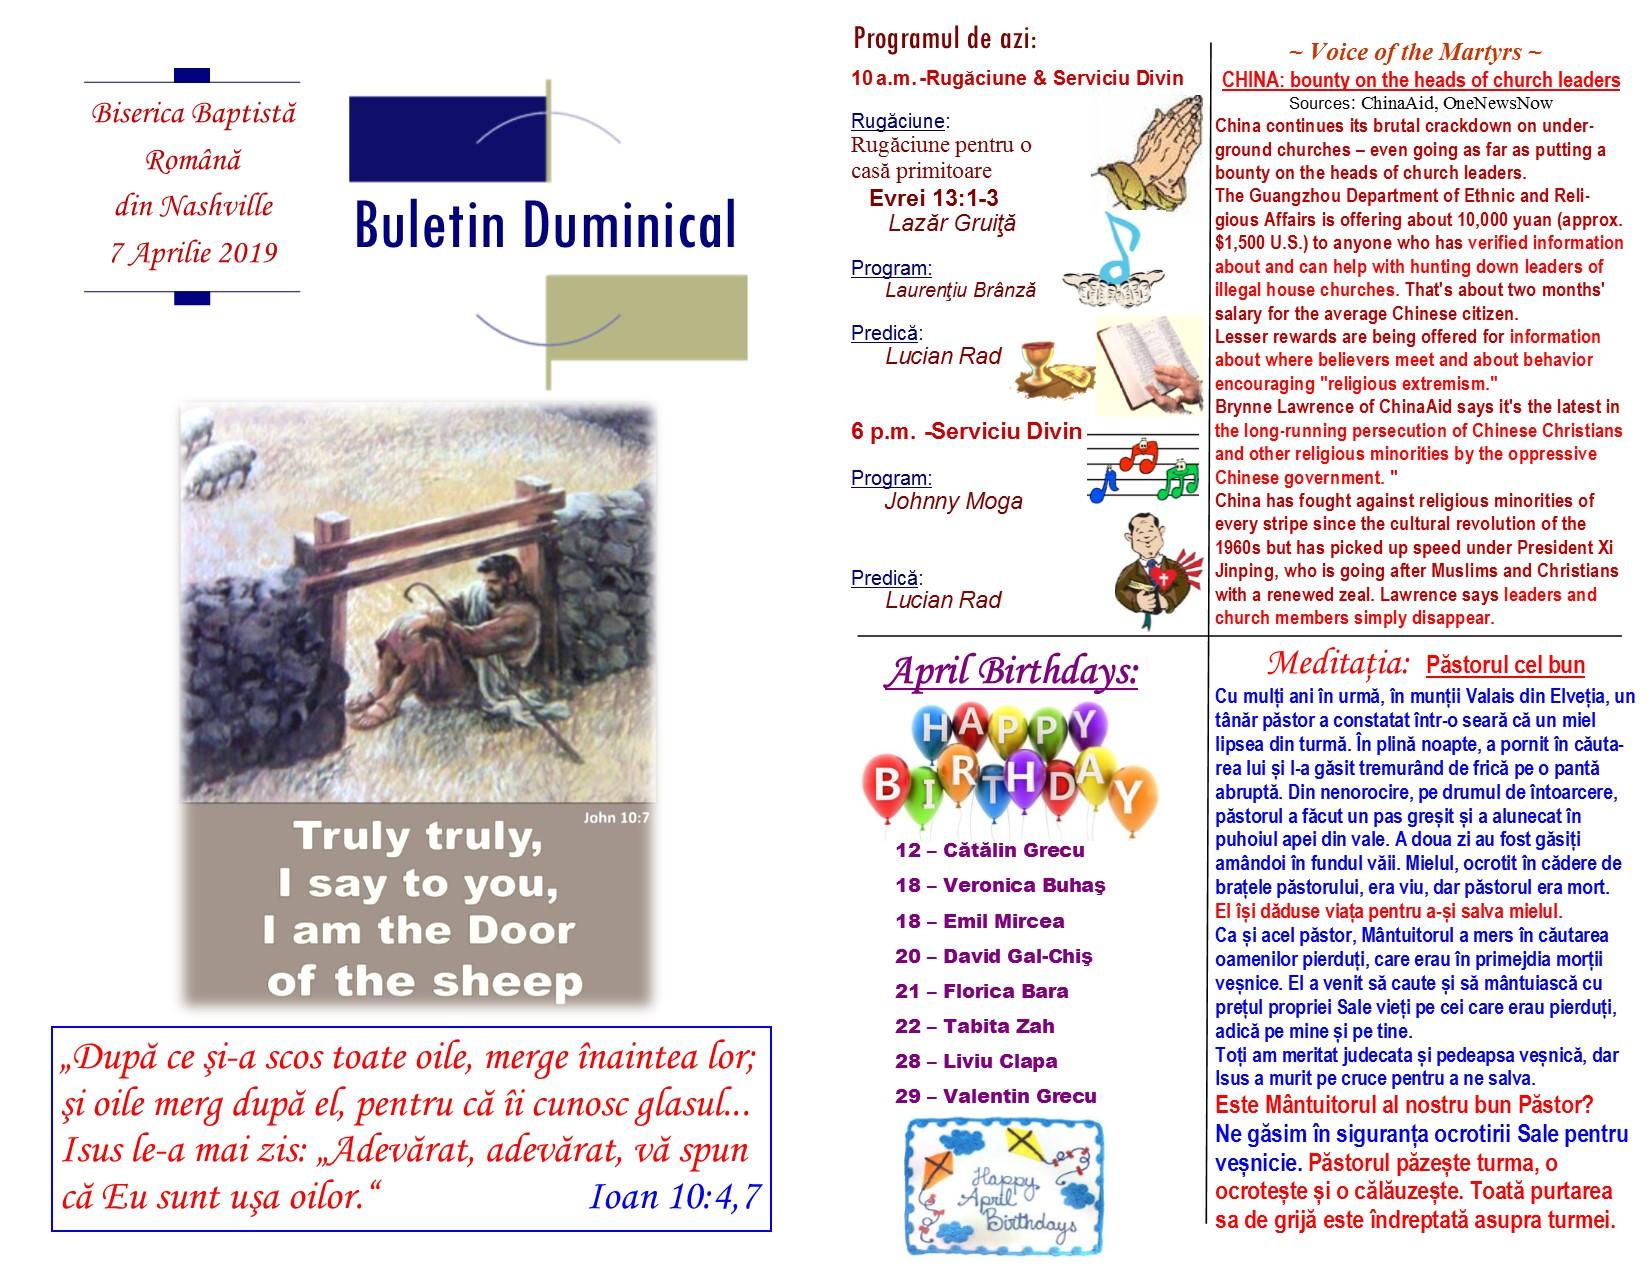 Buletin 04-07-19 page 1 & 2